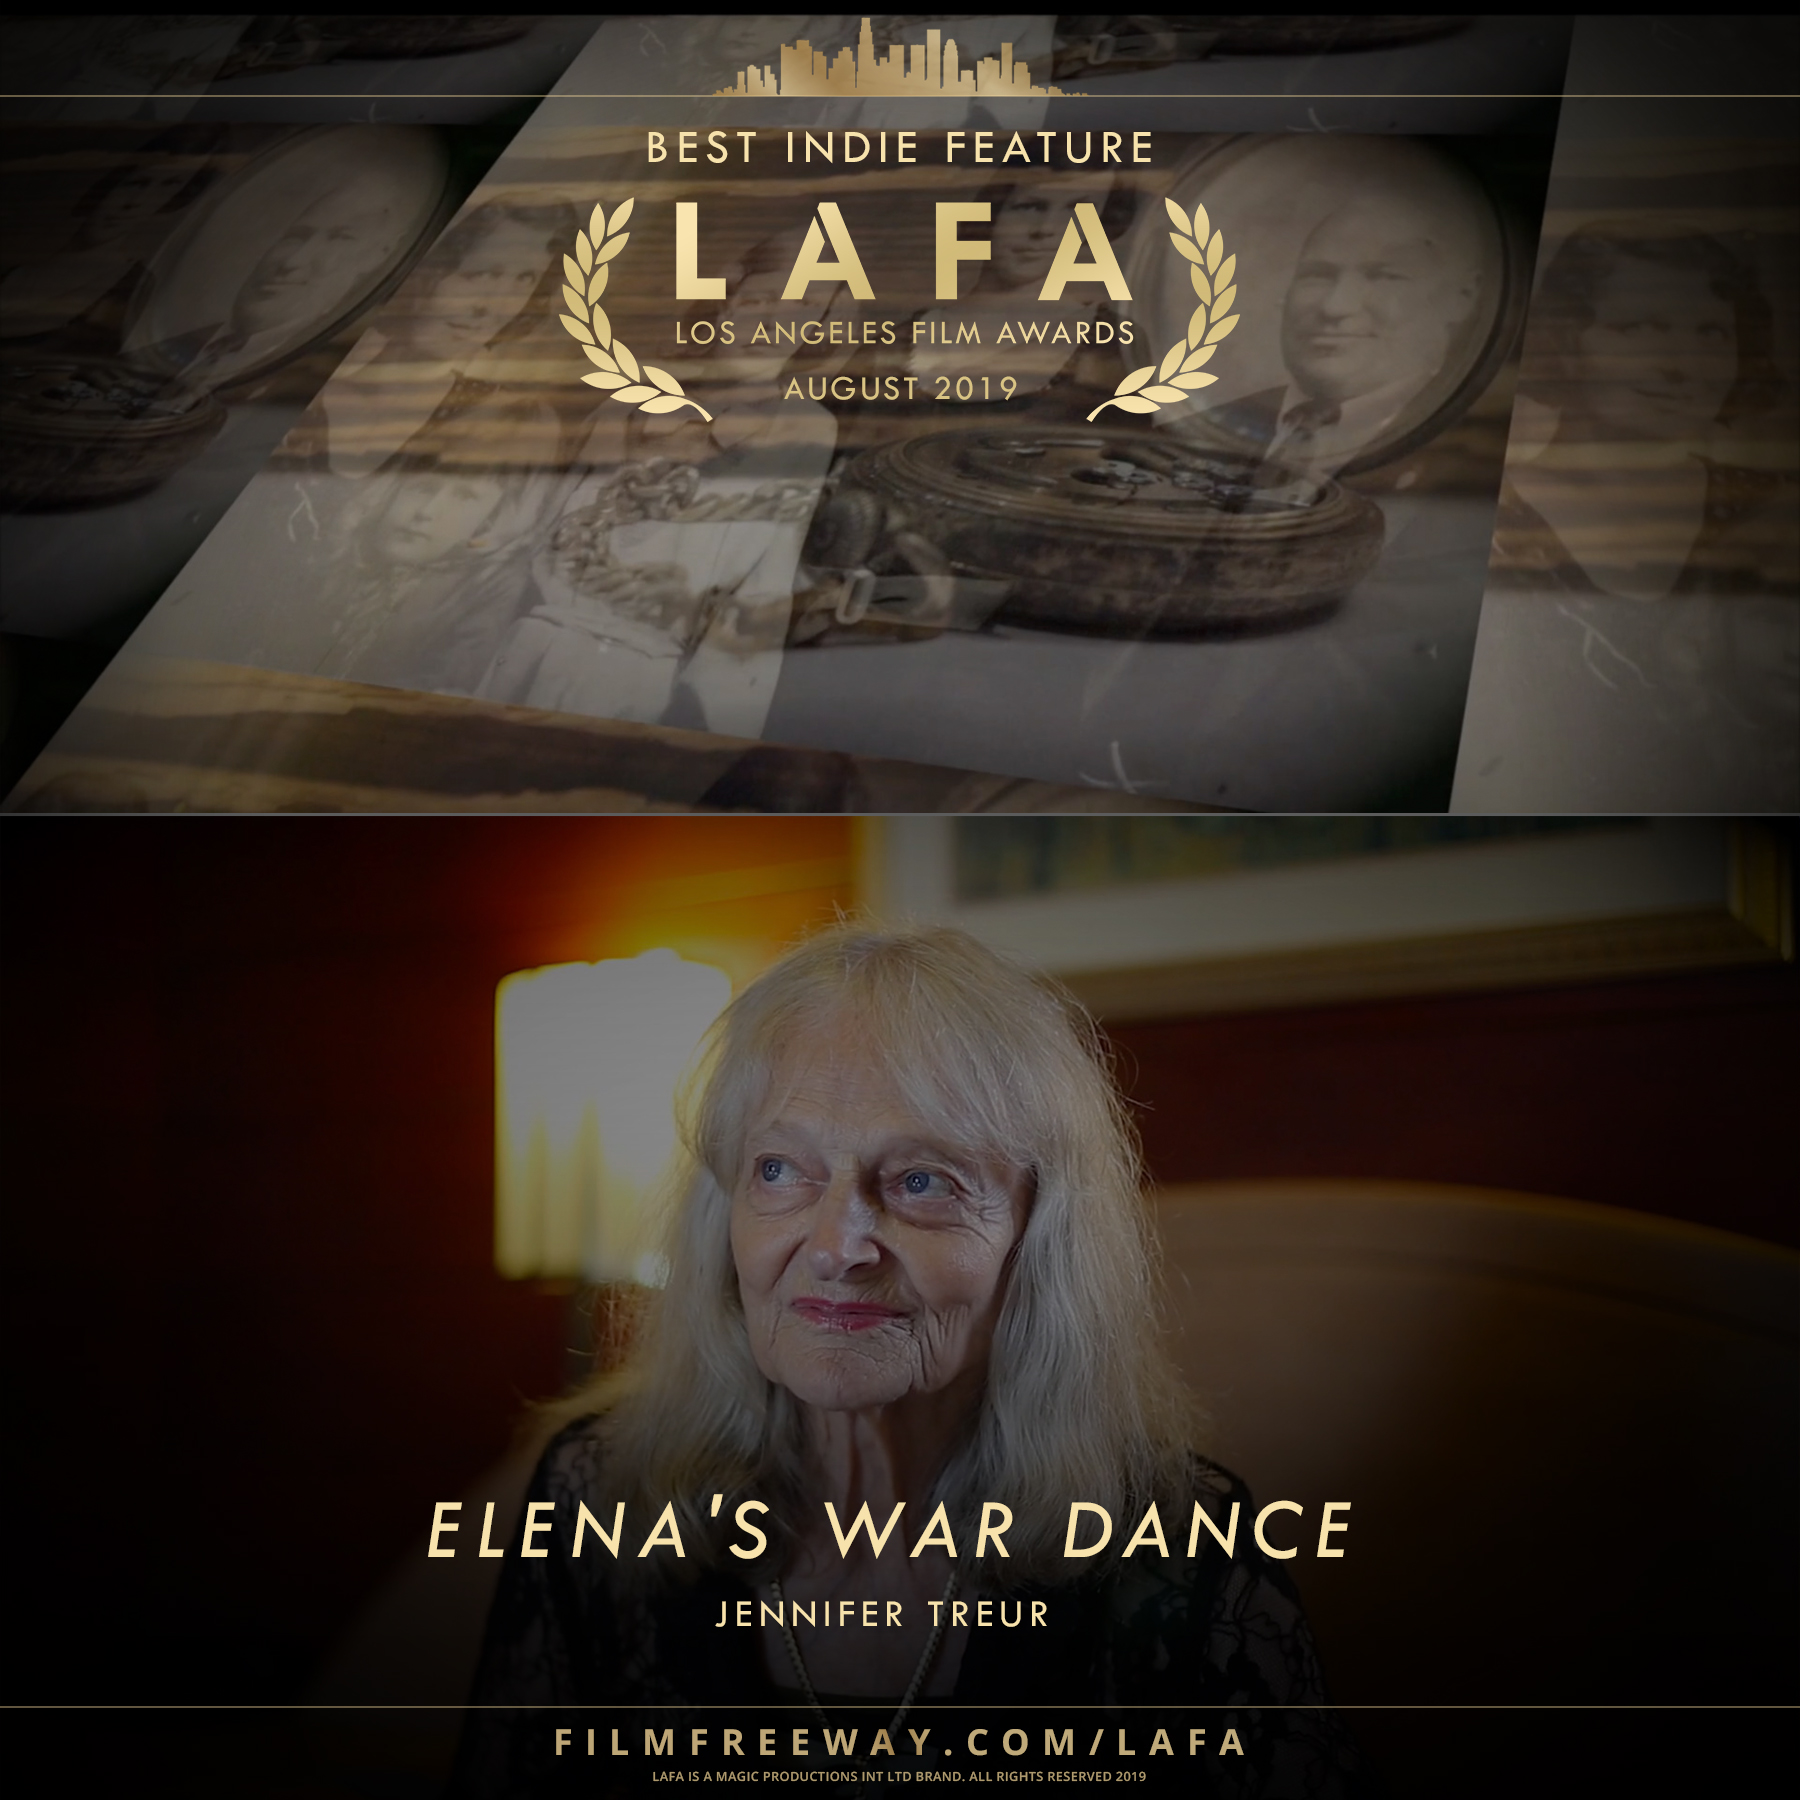 ELENA'S WAR DANCE design